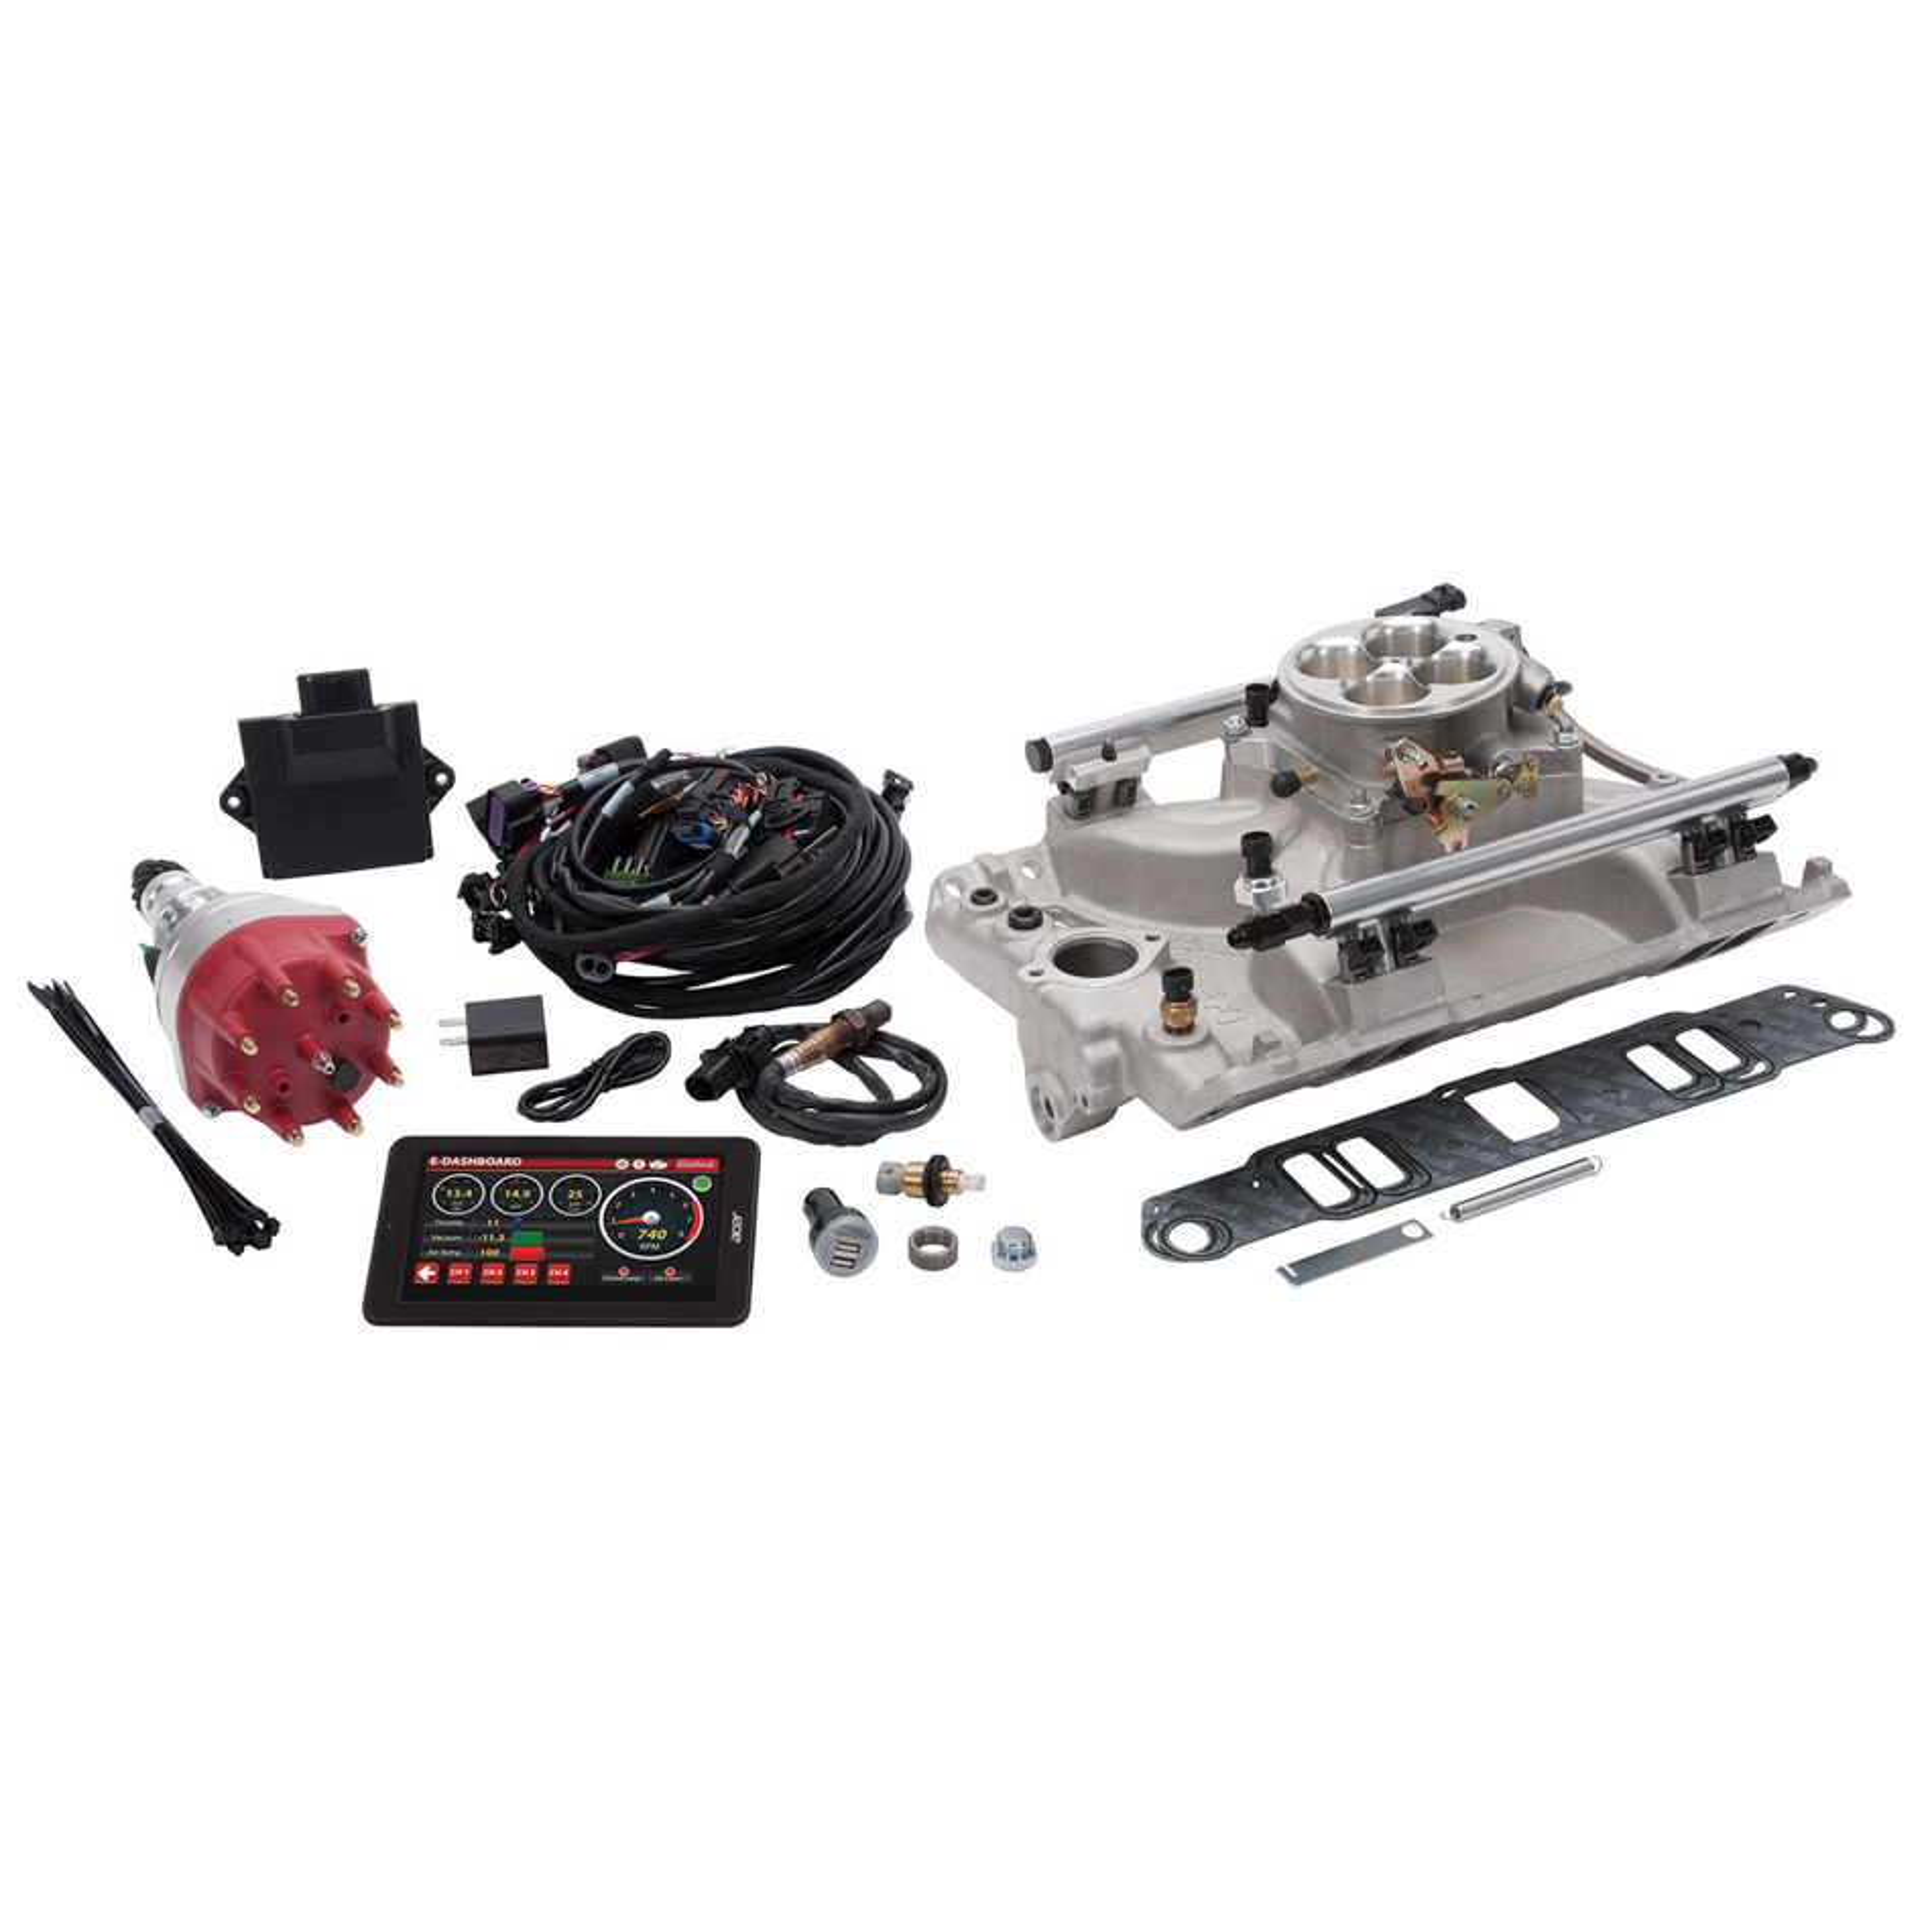 Edelbrock 35980 Fuel Injection, Pro-Flo 4, Multi Port, Sequential, Square Bore, 35 lb/hr Injectors, 1000 CFM, Aluminum, Natural, Pontiac V8, Kit